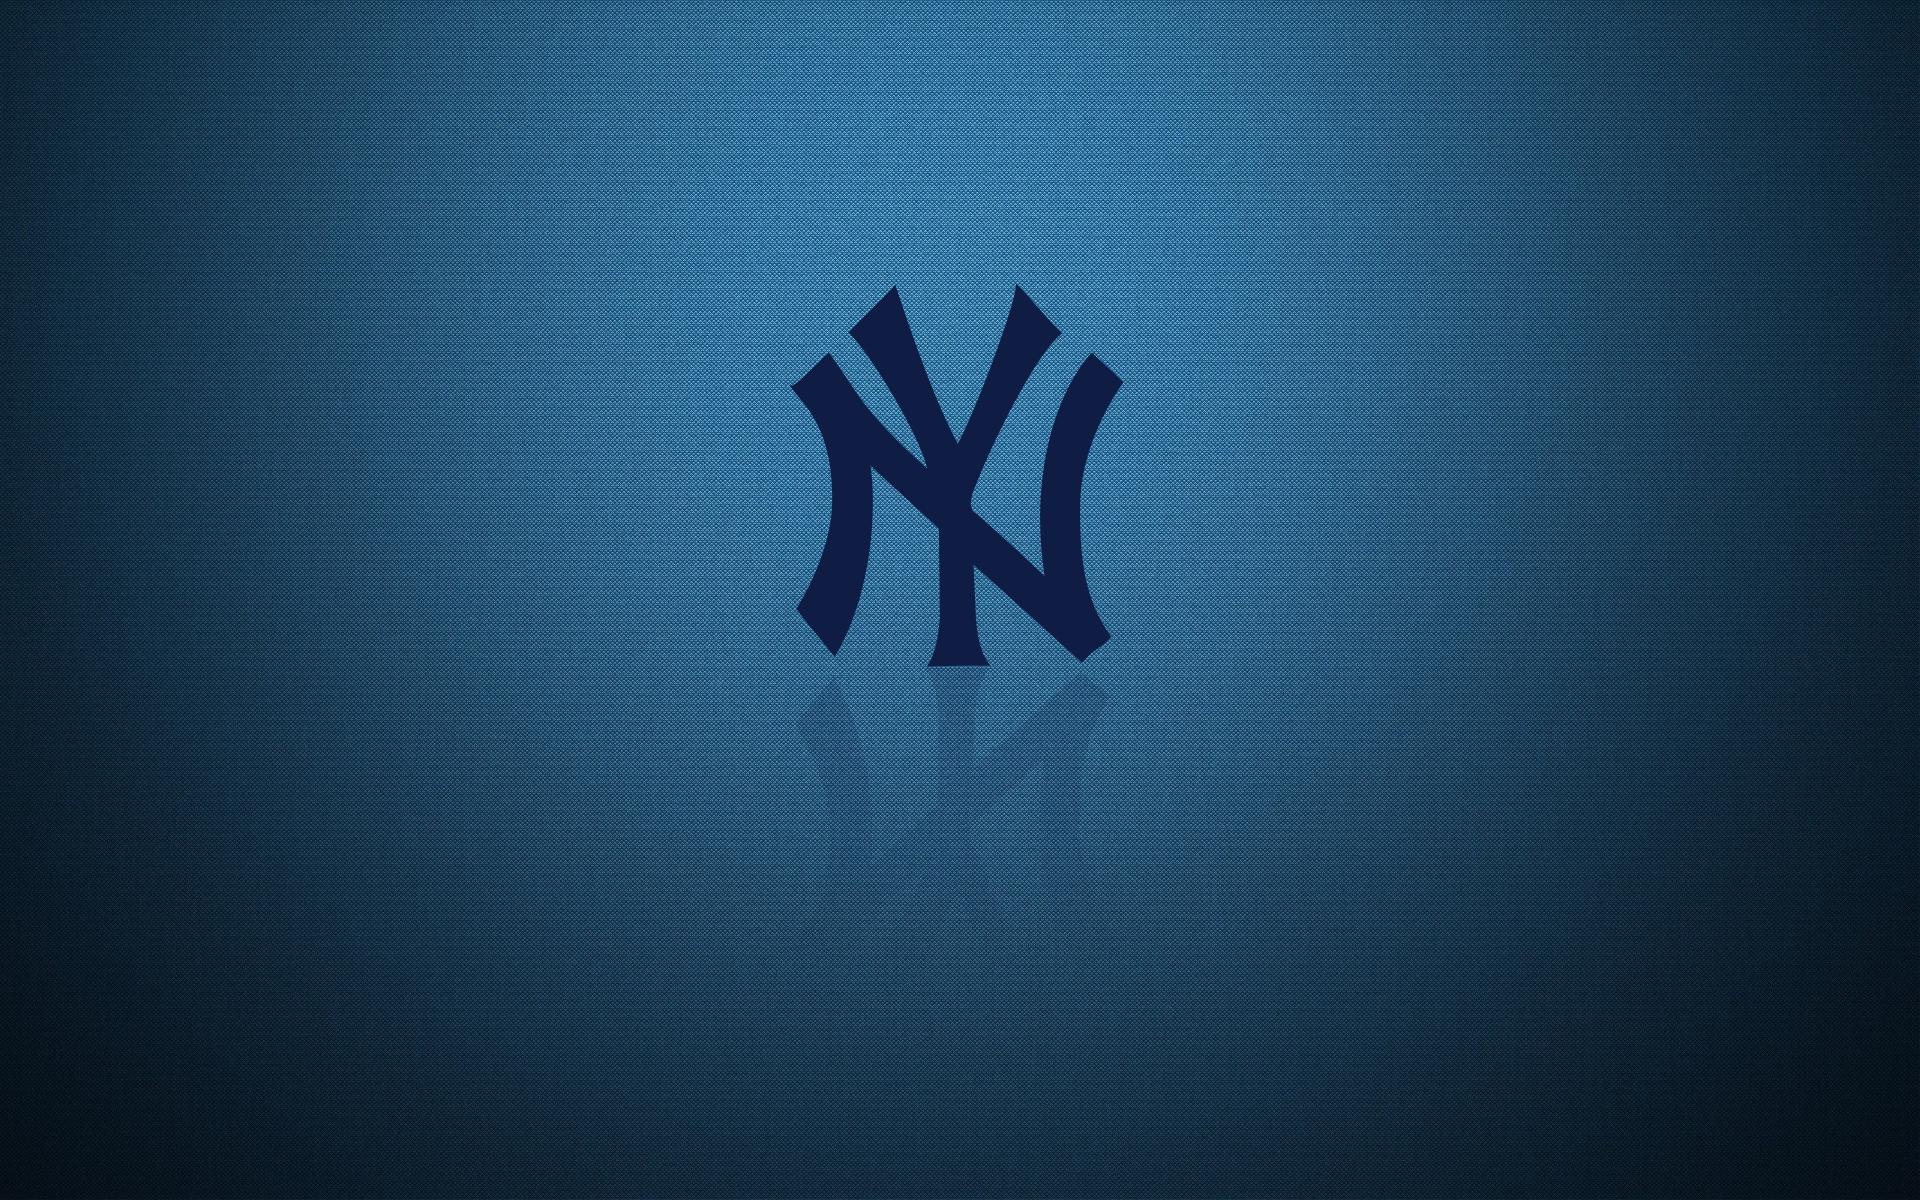 3d Wallpaper Ny Giants New York Yankees Logos Download